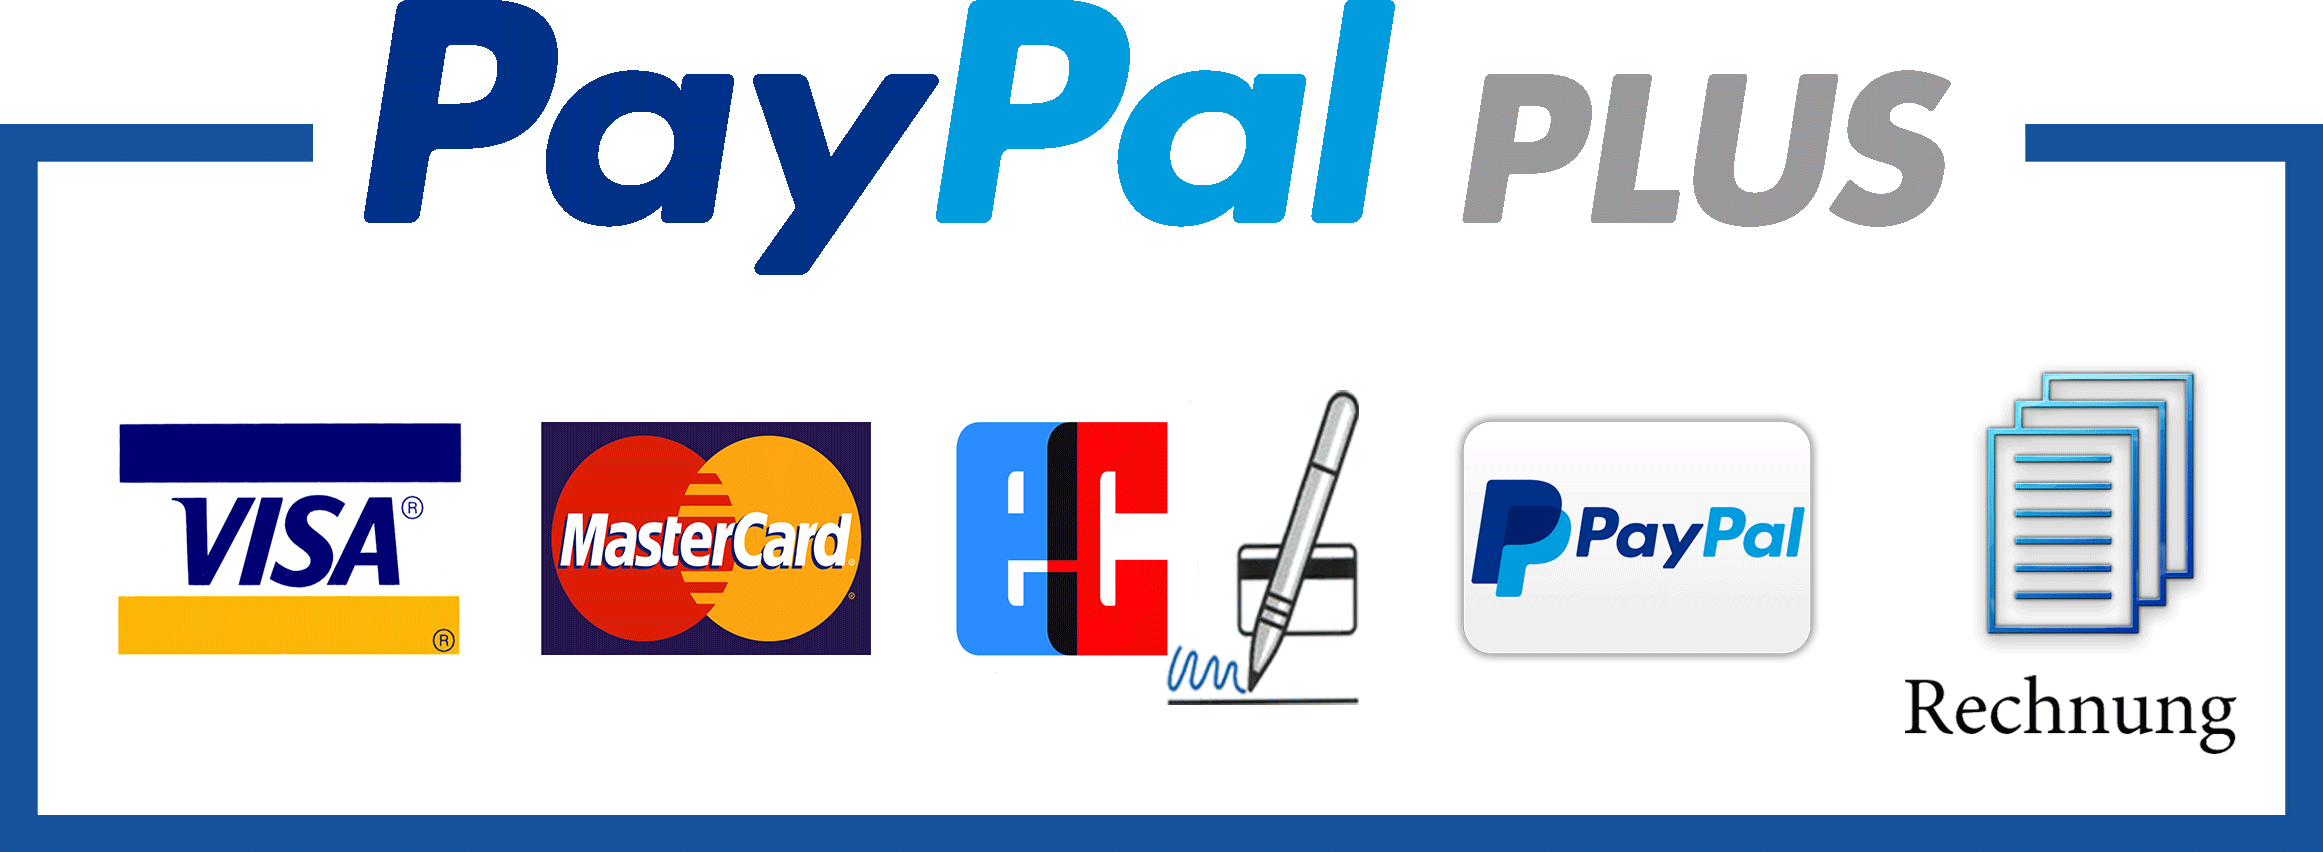 PayPal5acf6bce979b4